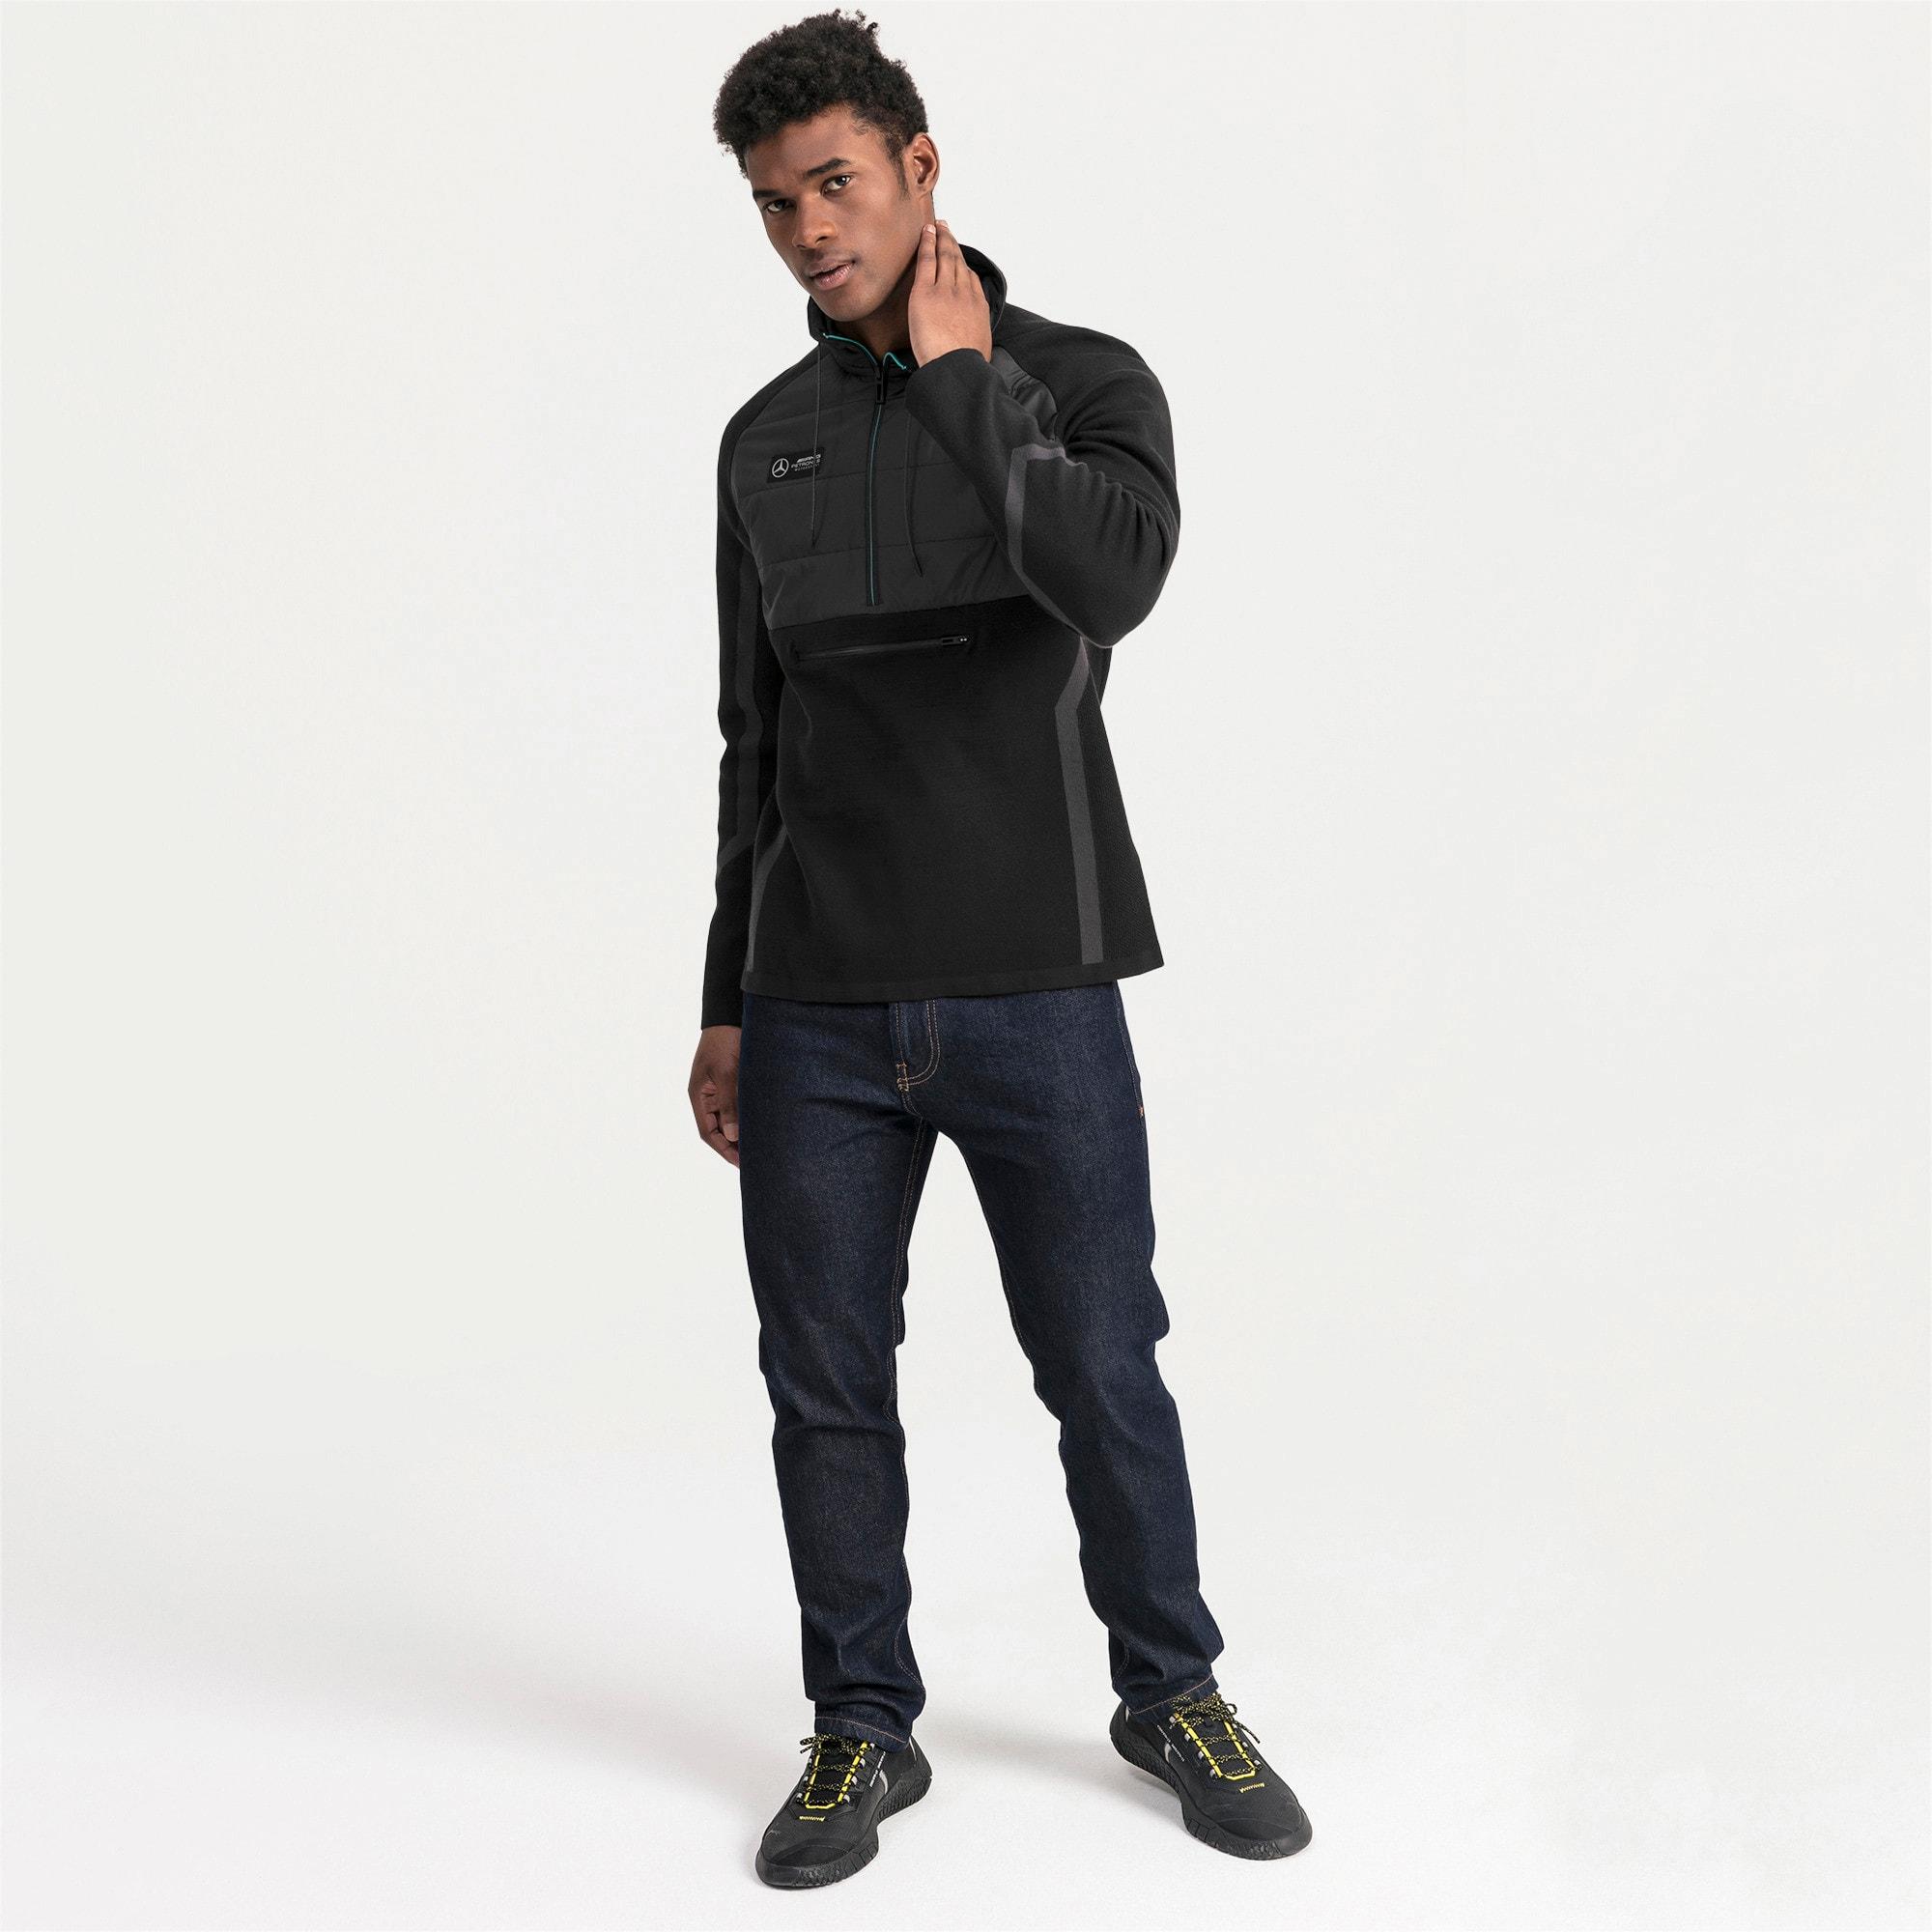 Thumbnail 3 of Mercedes AMG Petronas RCT evoKNIT Knitted Men's Sweater, Puma Black, medium